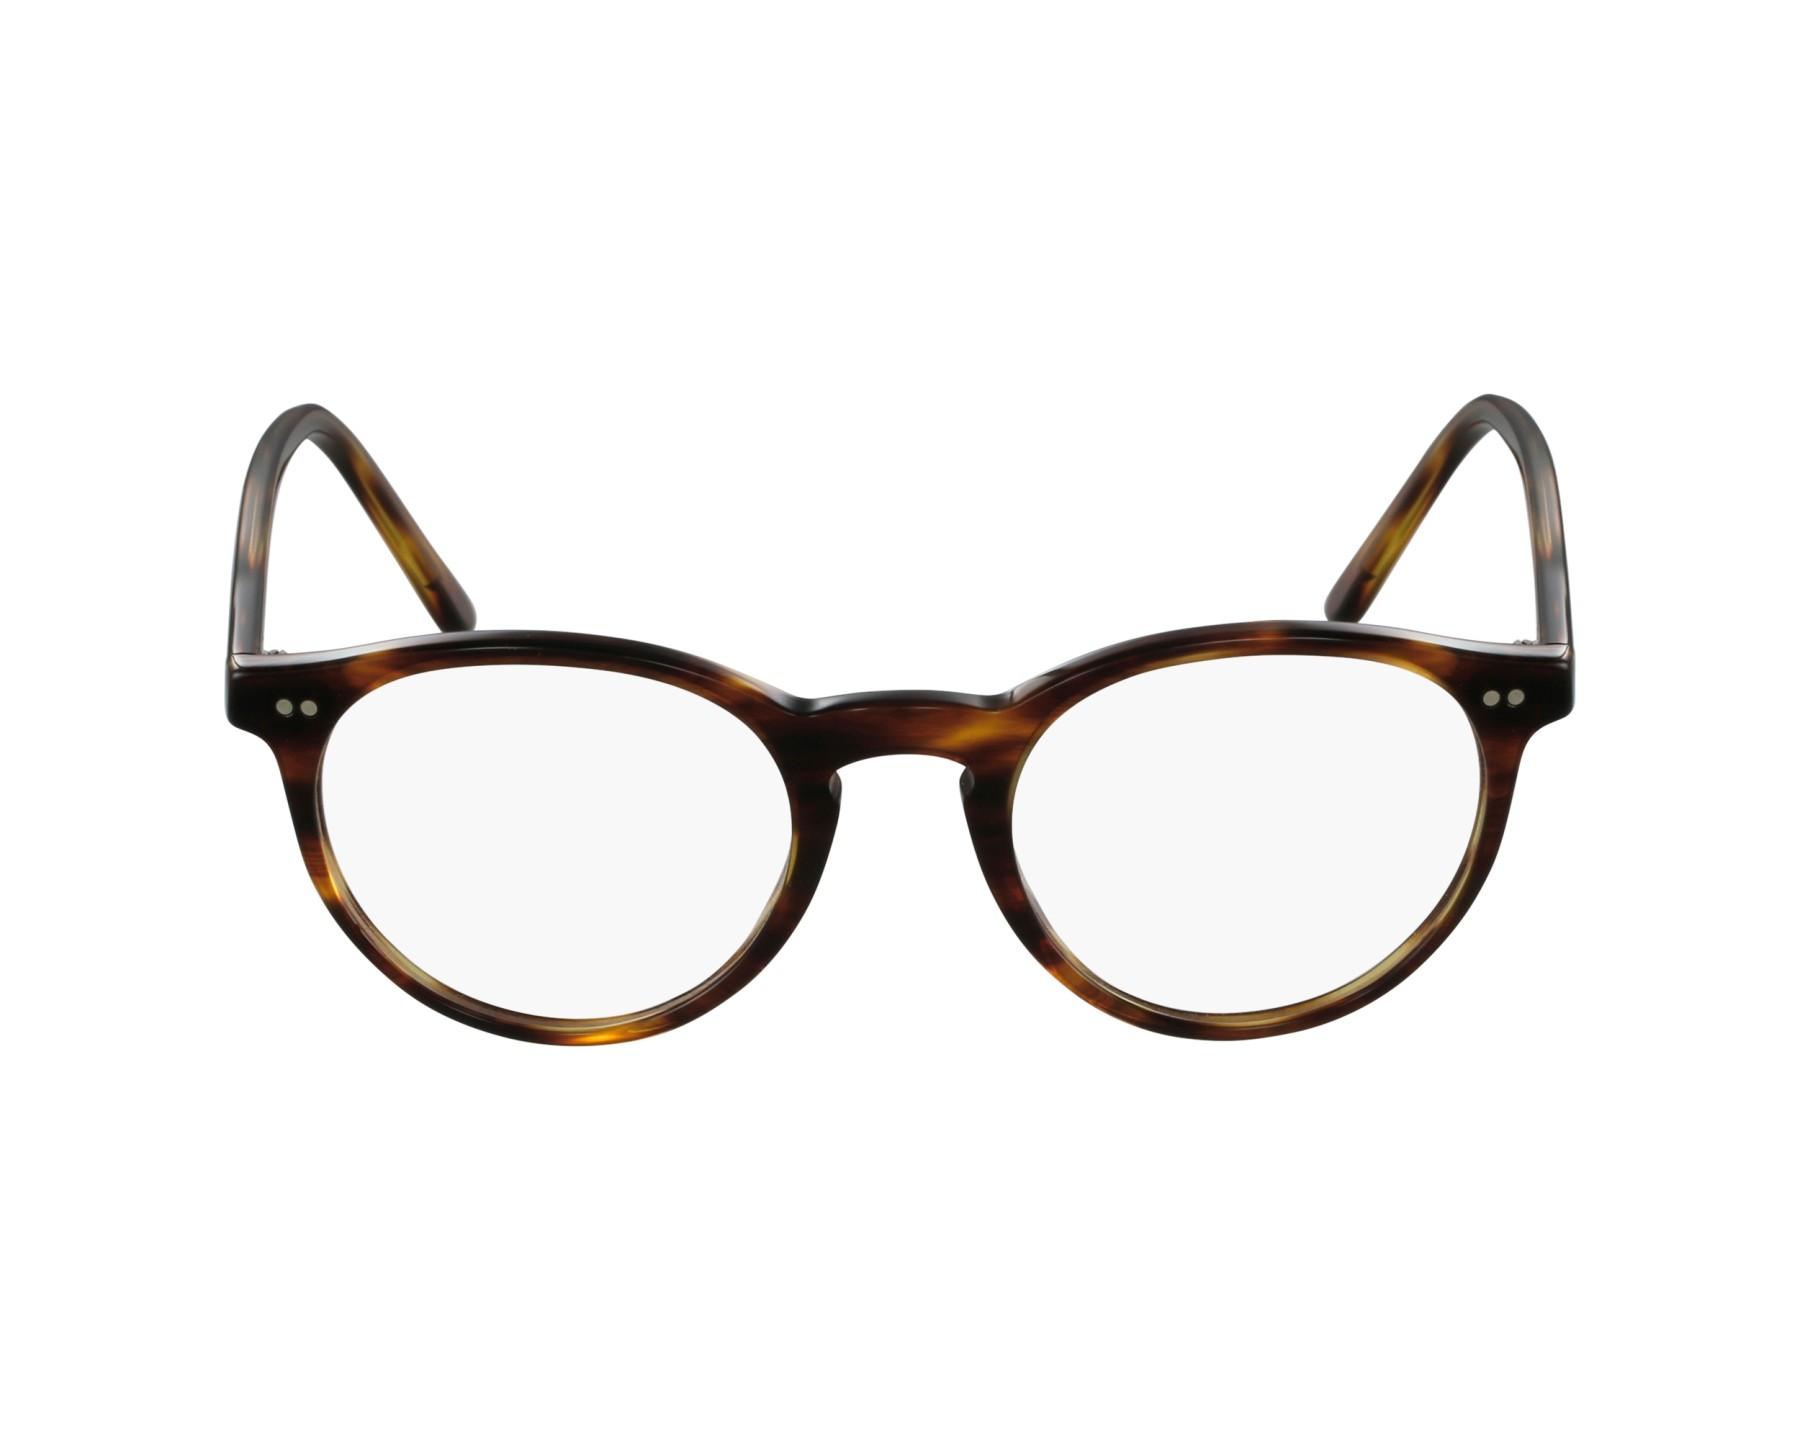 0acb4ad5be9e eyeglasses Polo Ralph Lauren PH-2083 5007 48-20 Havana profile view